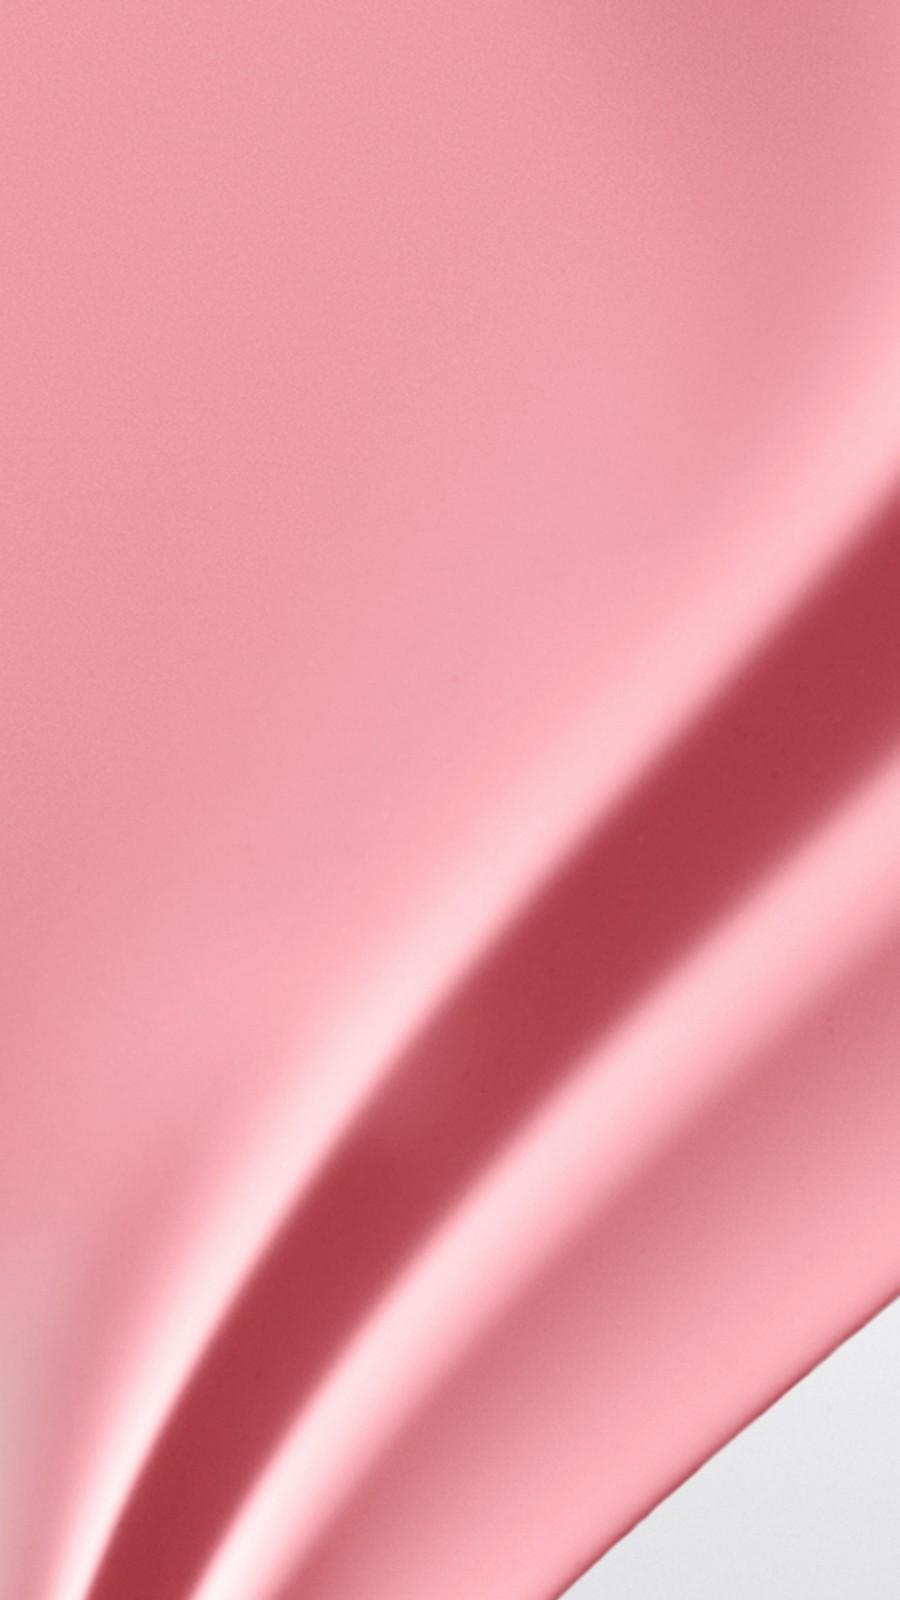 Tea rose 05 Lip Glow - Tea Rose No.05 - Image 2